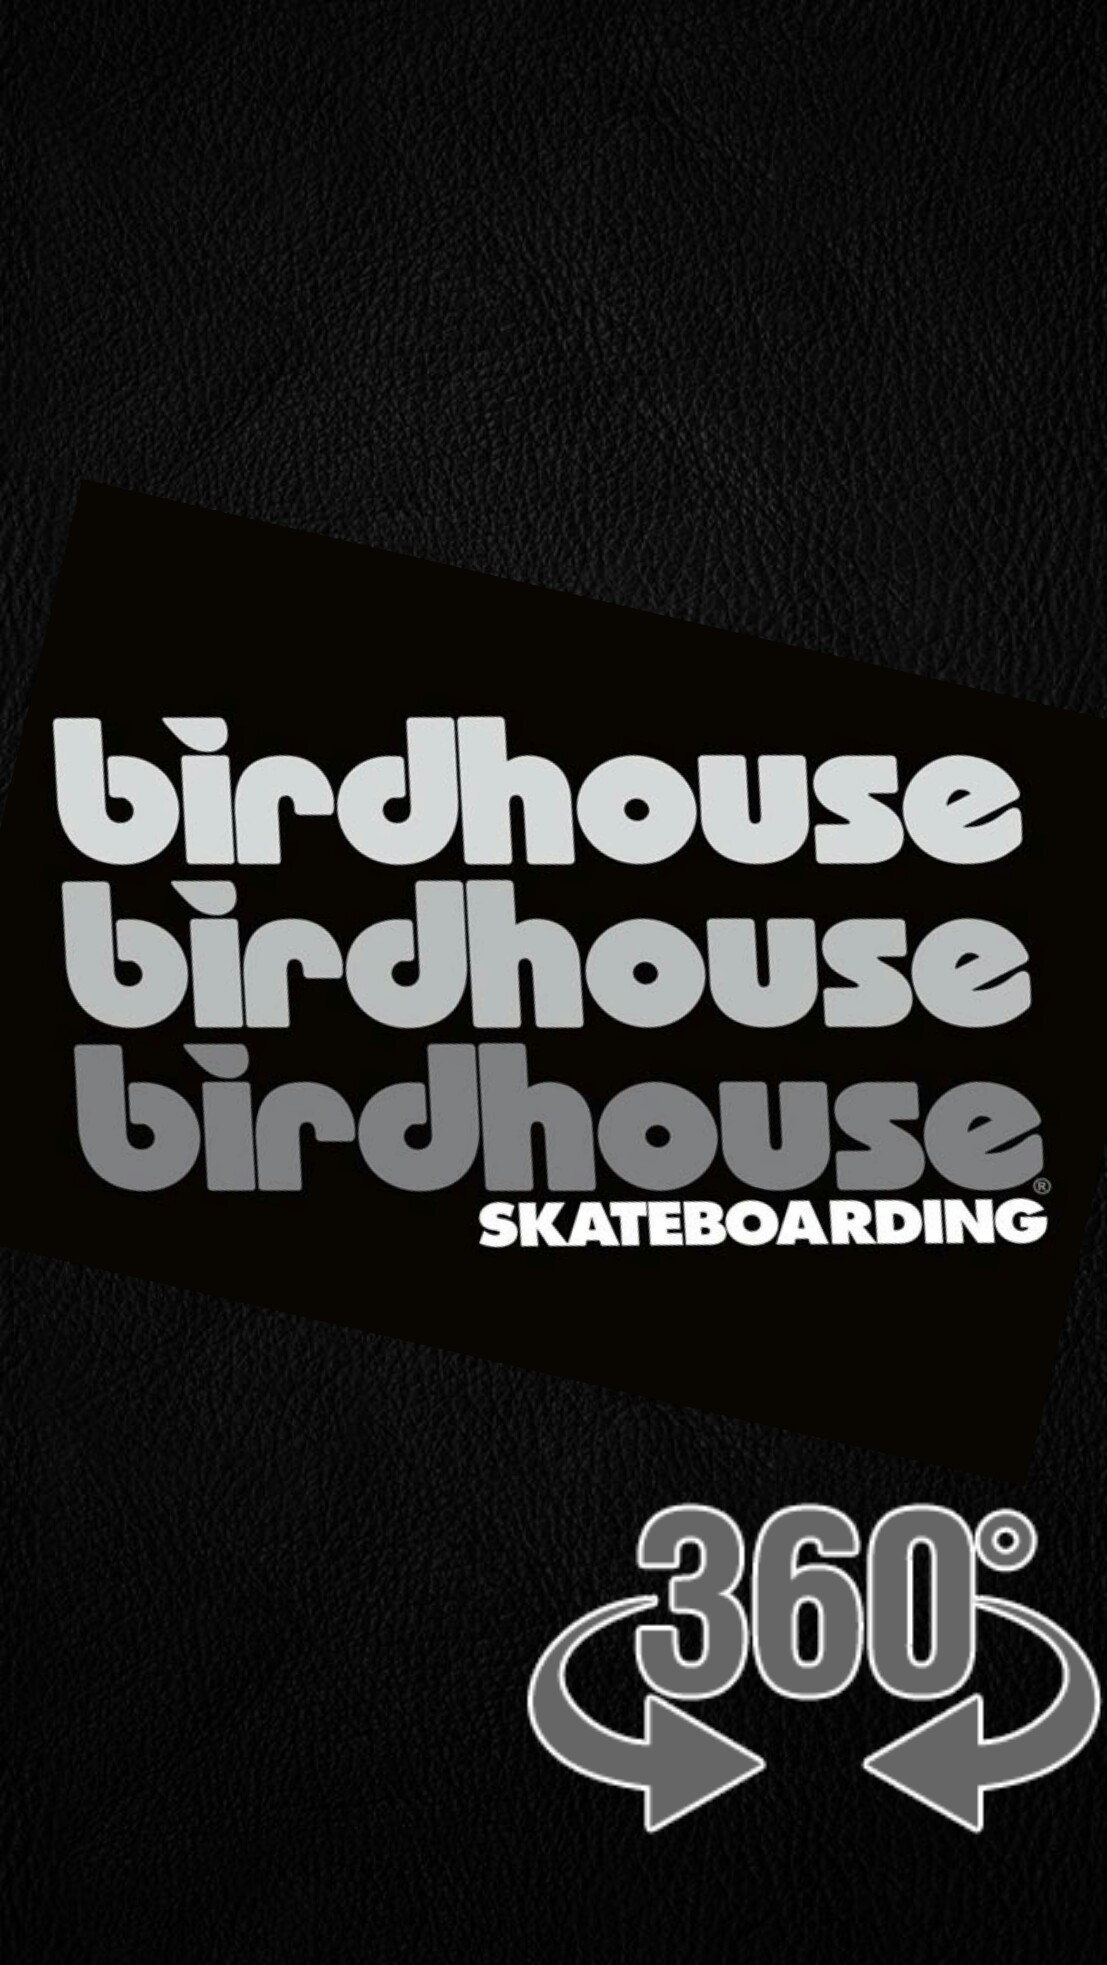 #skateboard #loading #black #wallpaper #android #iphone